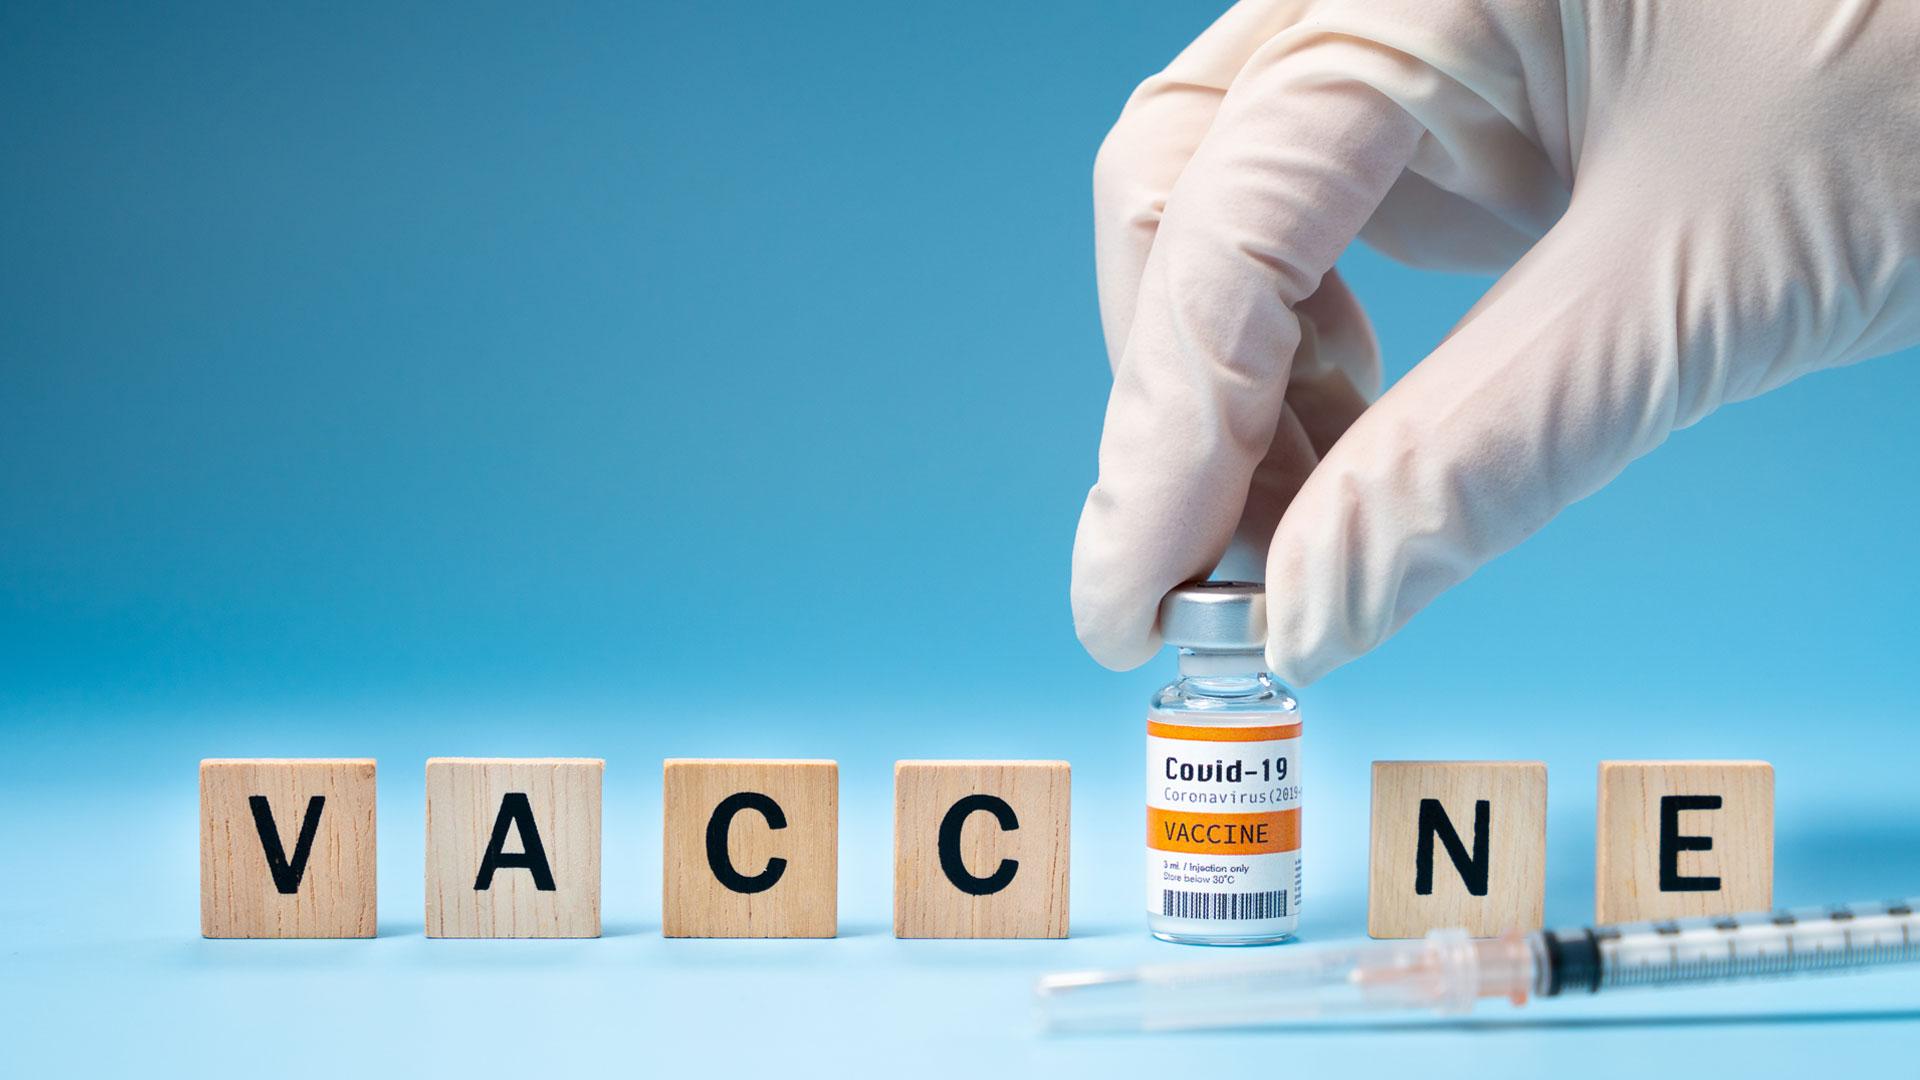 COVID-19 Vaccine Marketing Campaigns – Can Nudge Marketing Help?